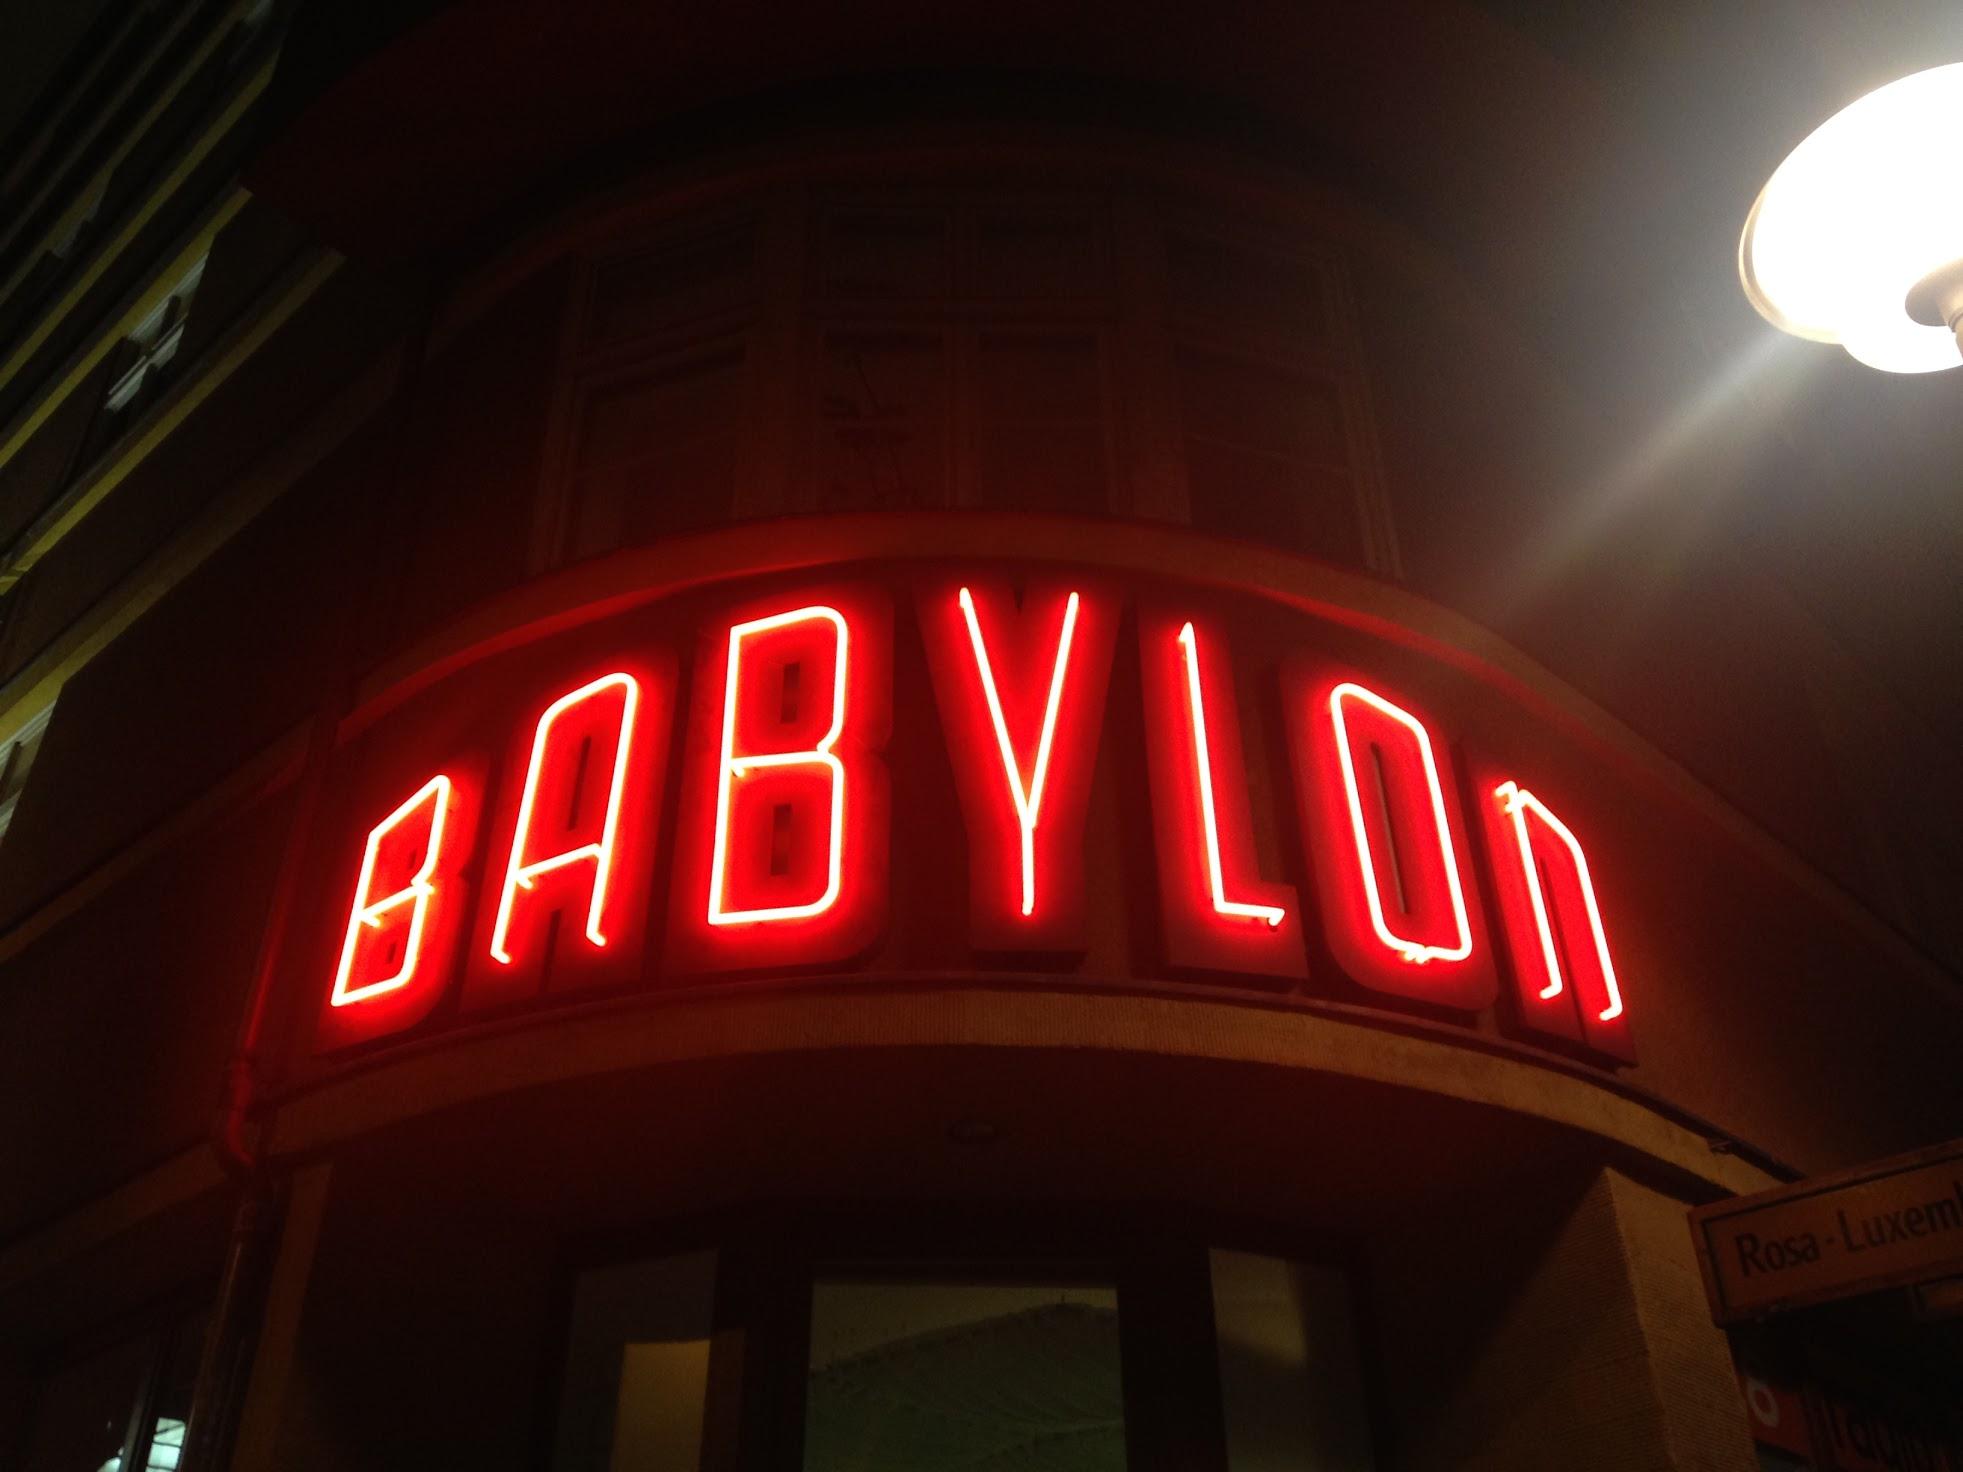 Kino Babylon, Rosa-Luxemburg-Platz